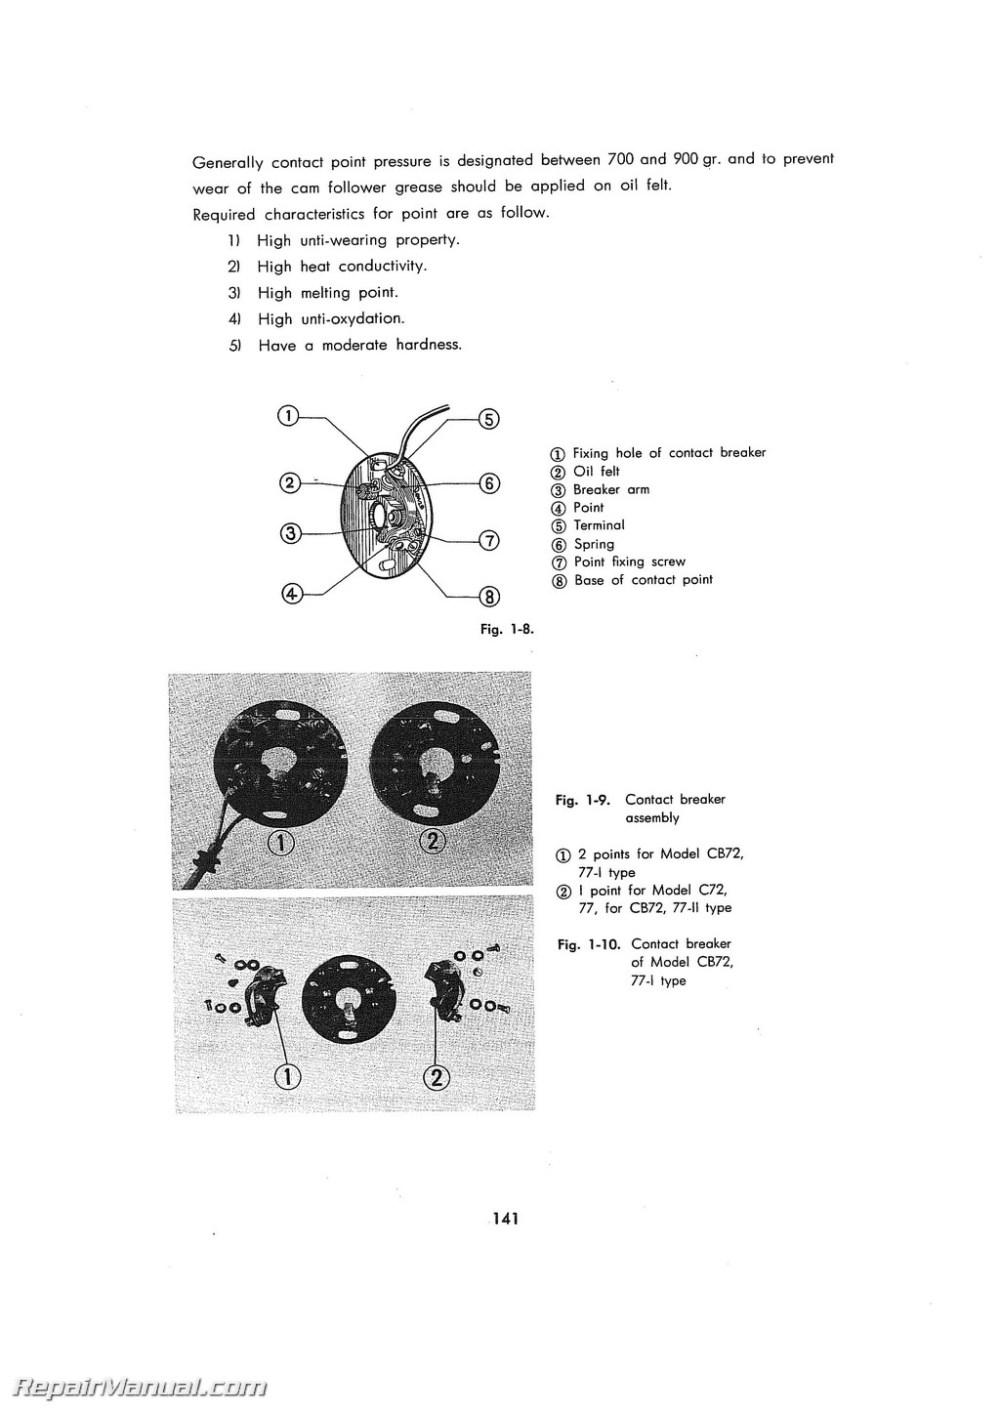 medium resolution of honda 1961 1968 c72 c77 cs72 cs77 cb72 cb77 250cc motorcycle service